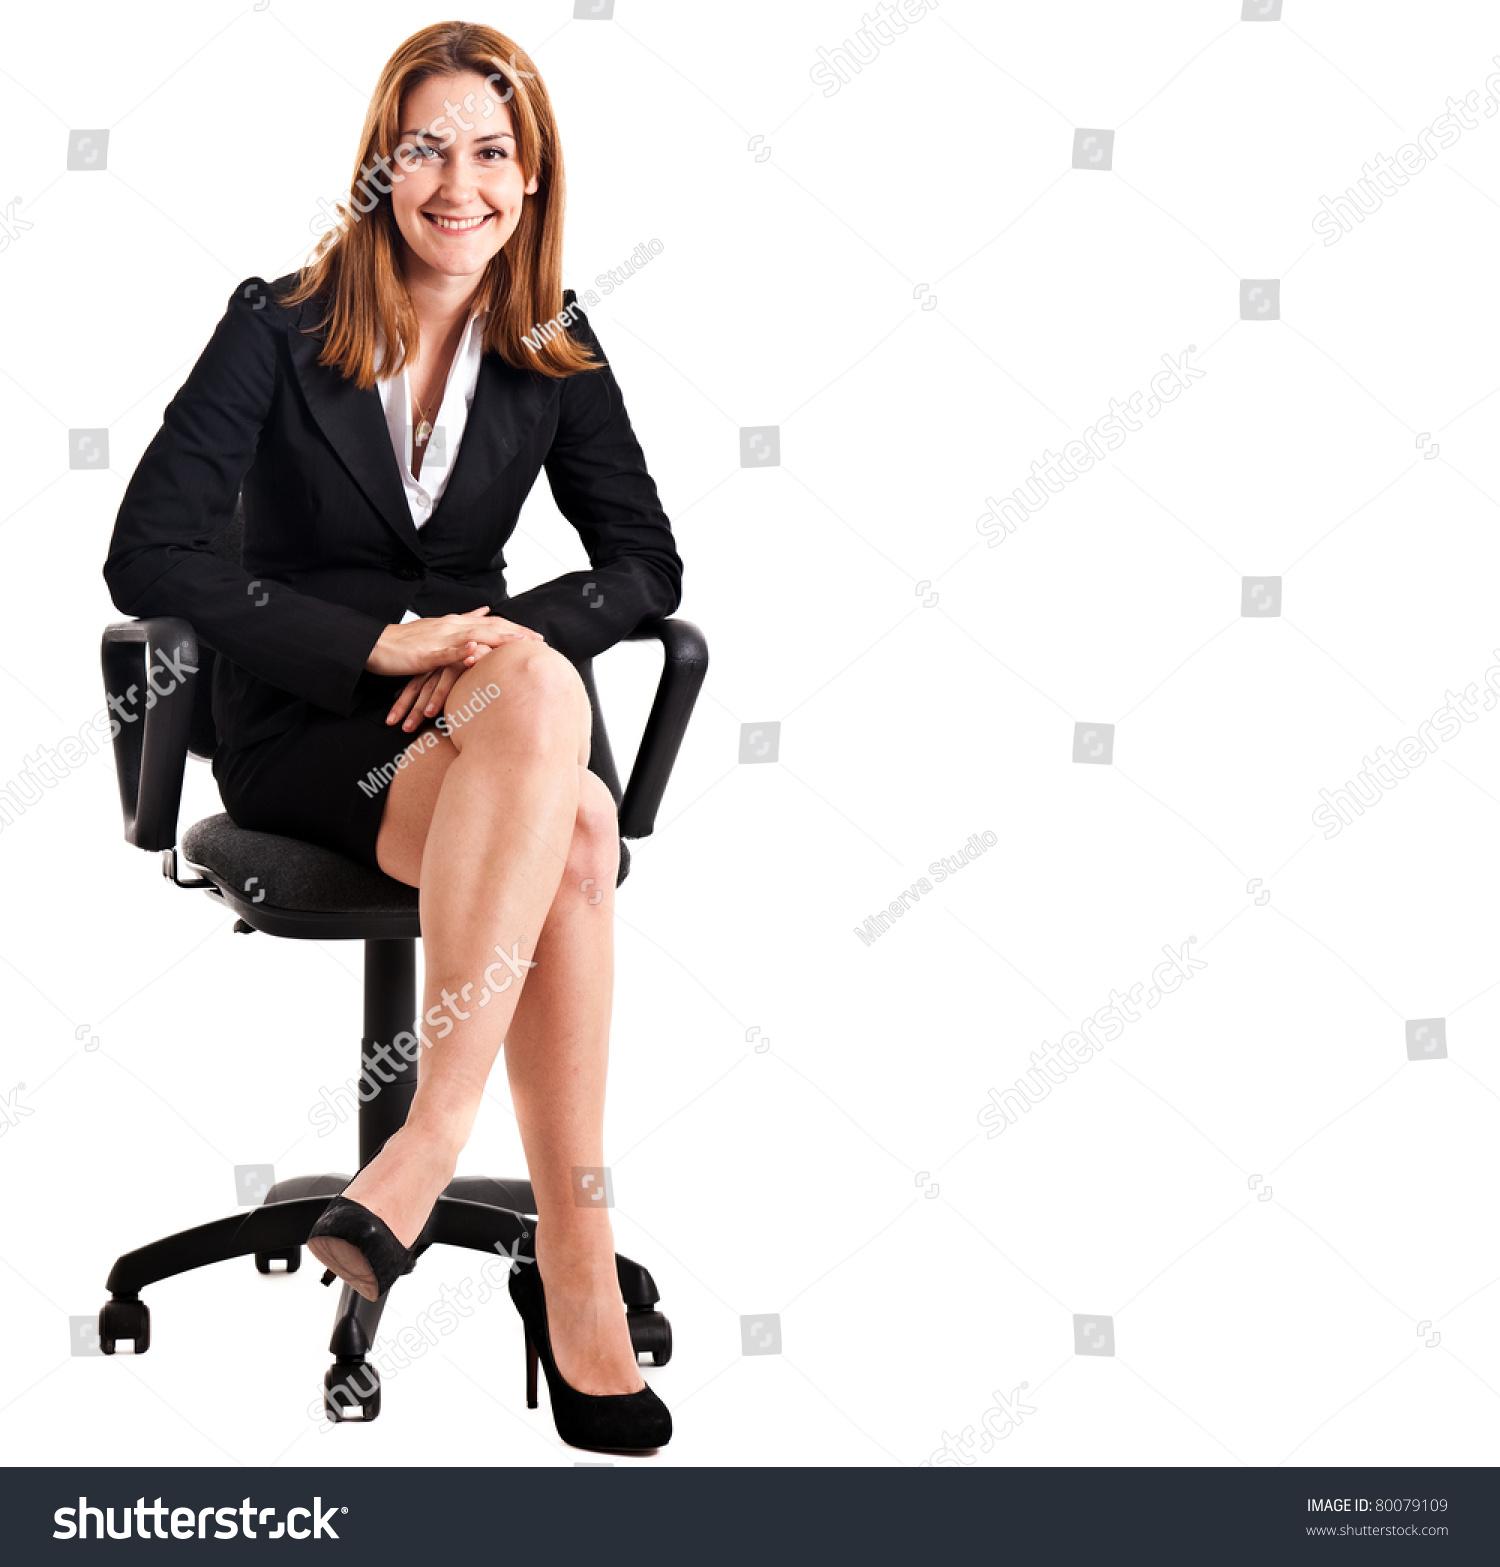 stock-photo-businesswoman-sitting-on-a-c